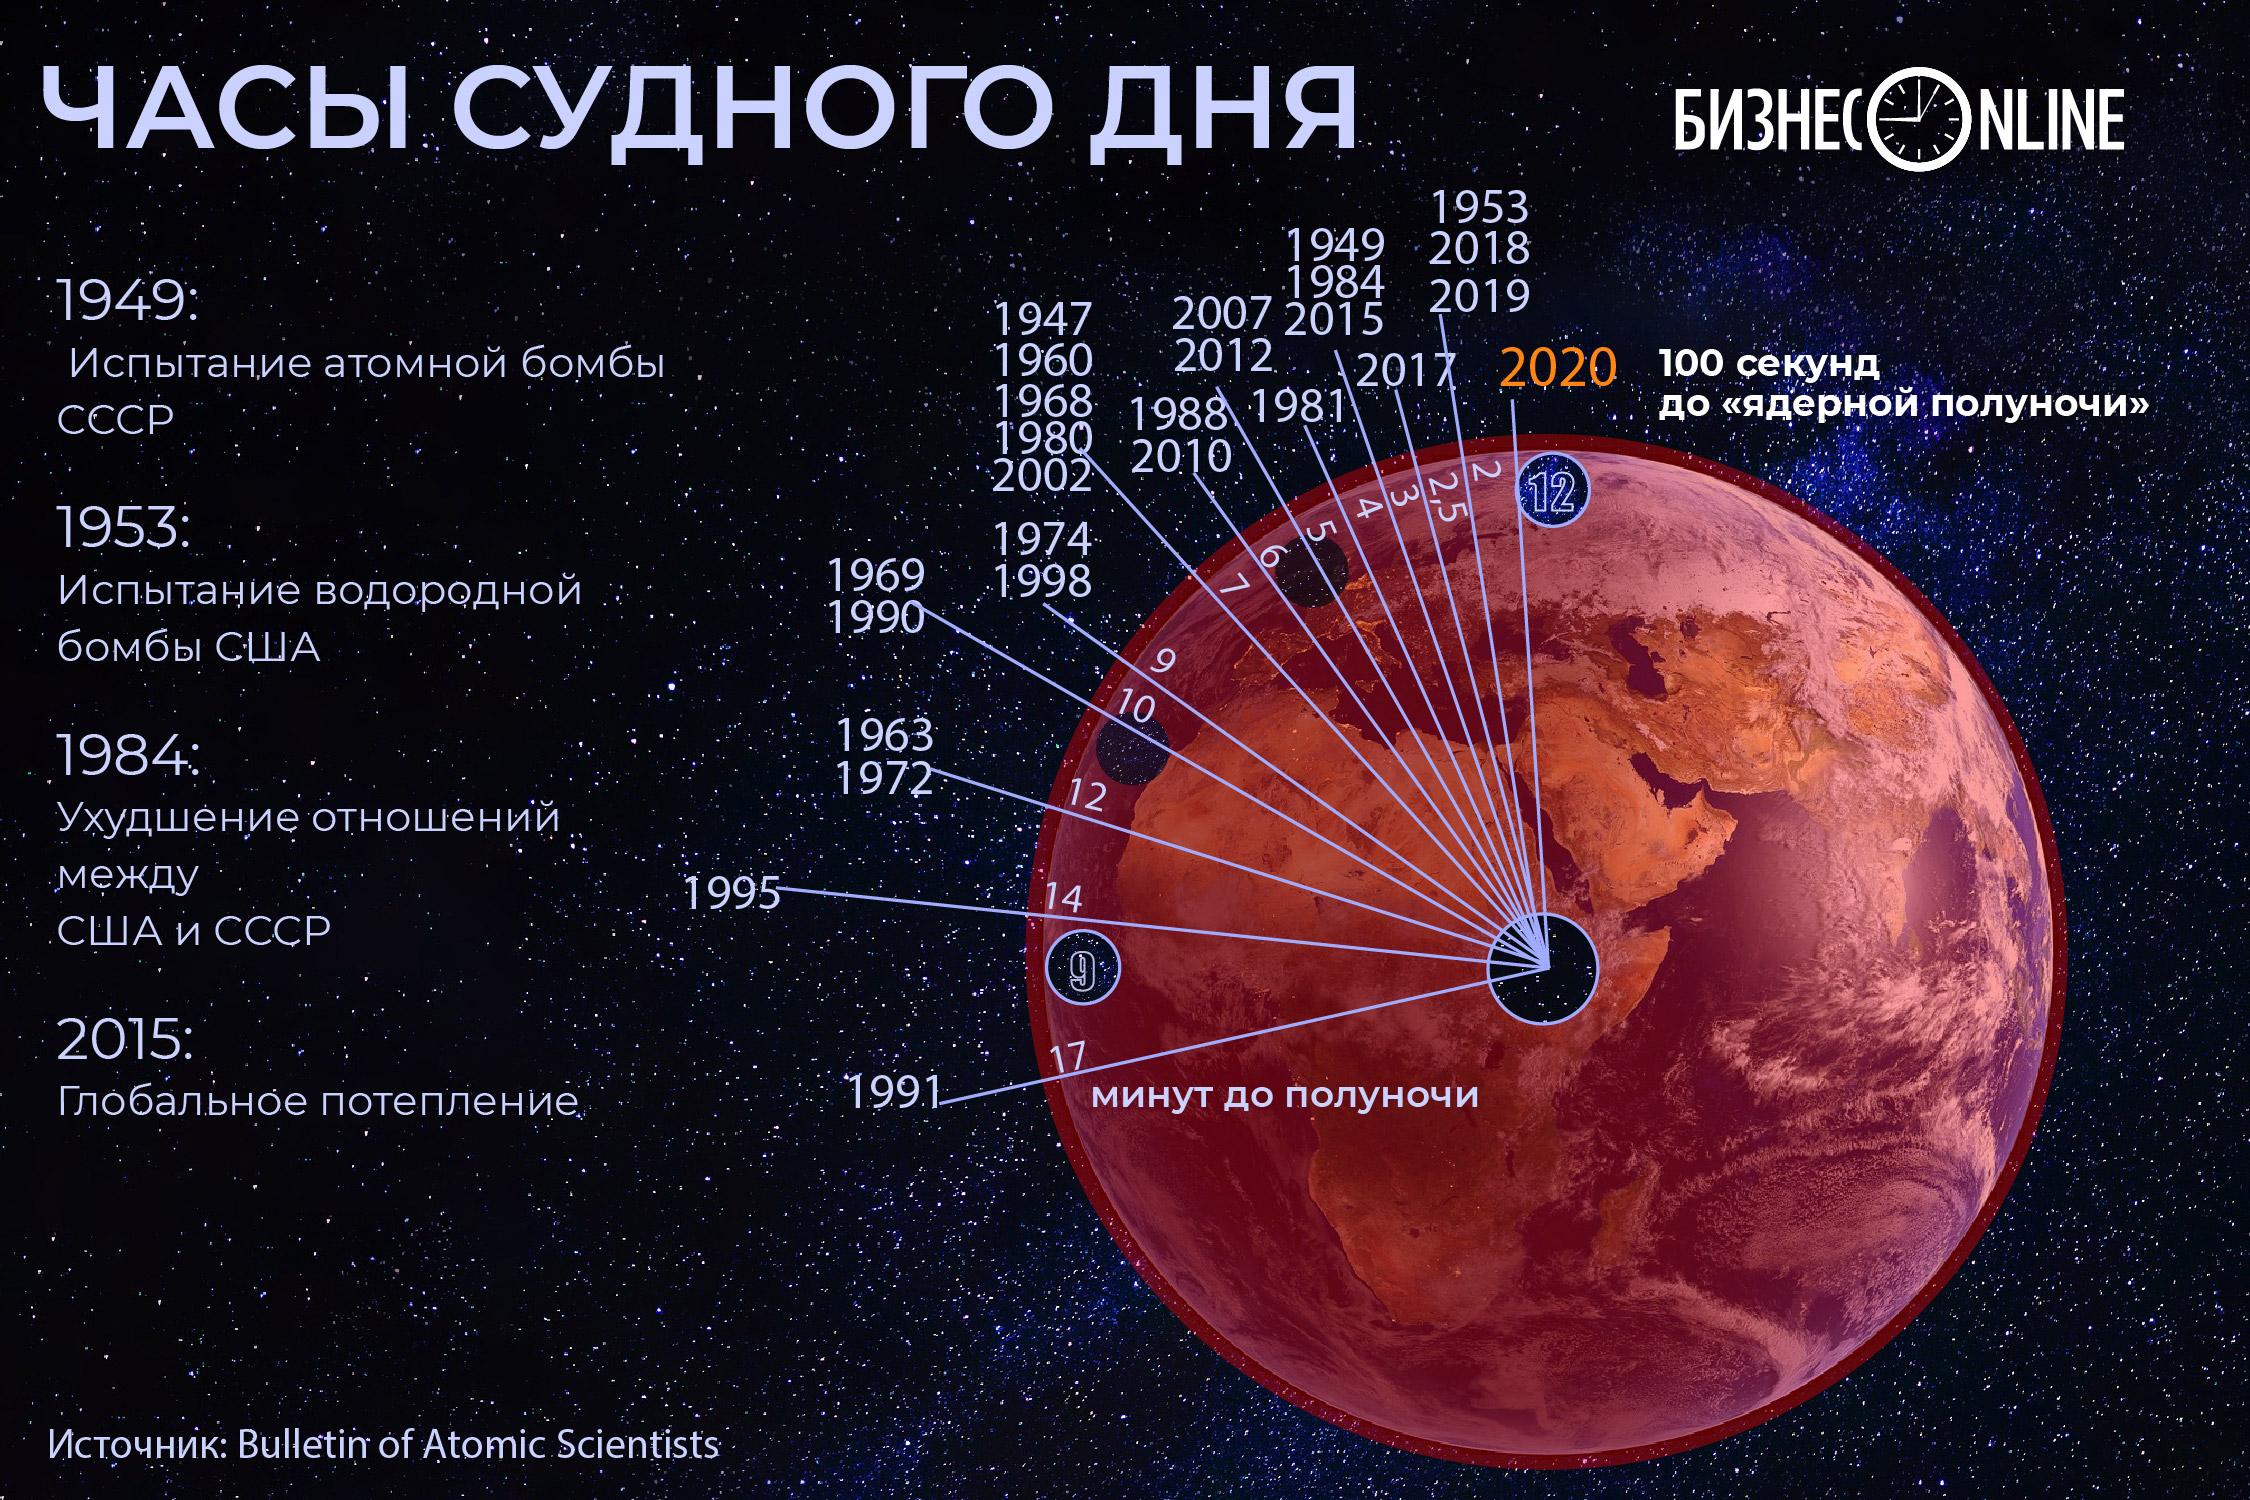 100 секунд до «ядерной полуночи»: стрелки часов Судного дня перевели вперед